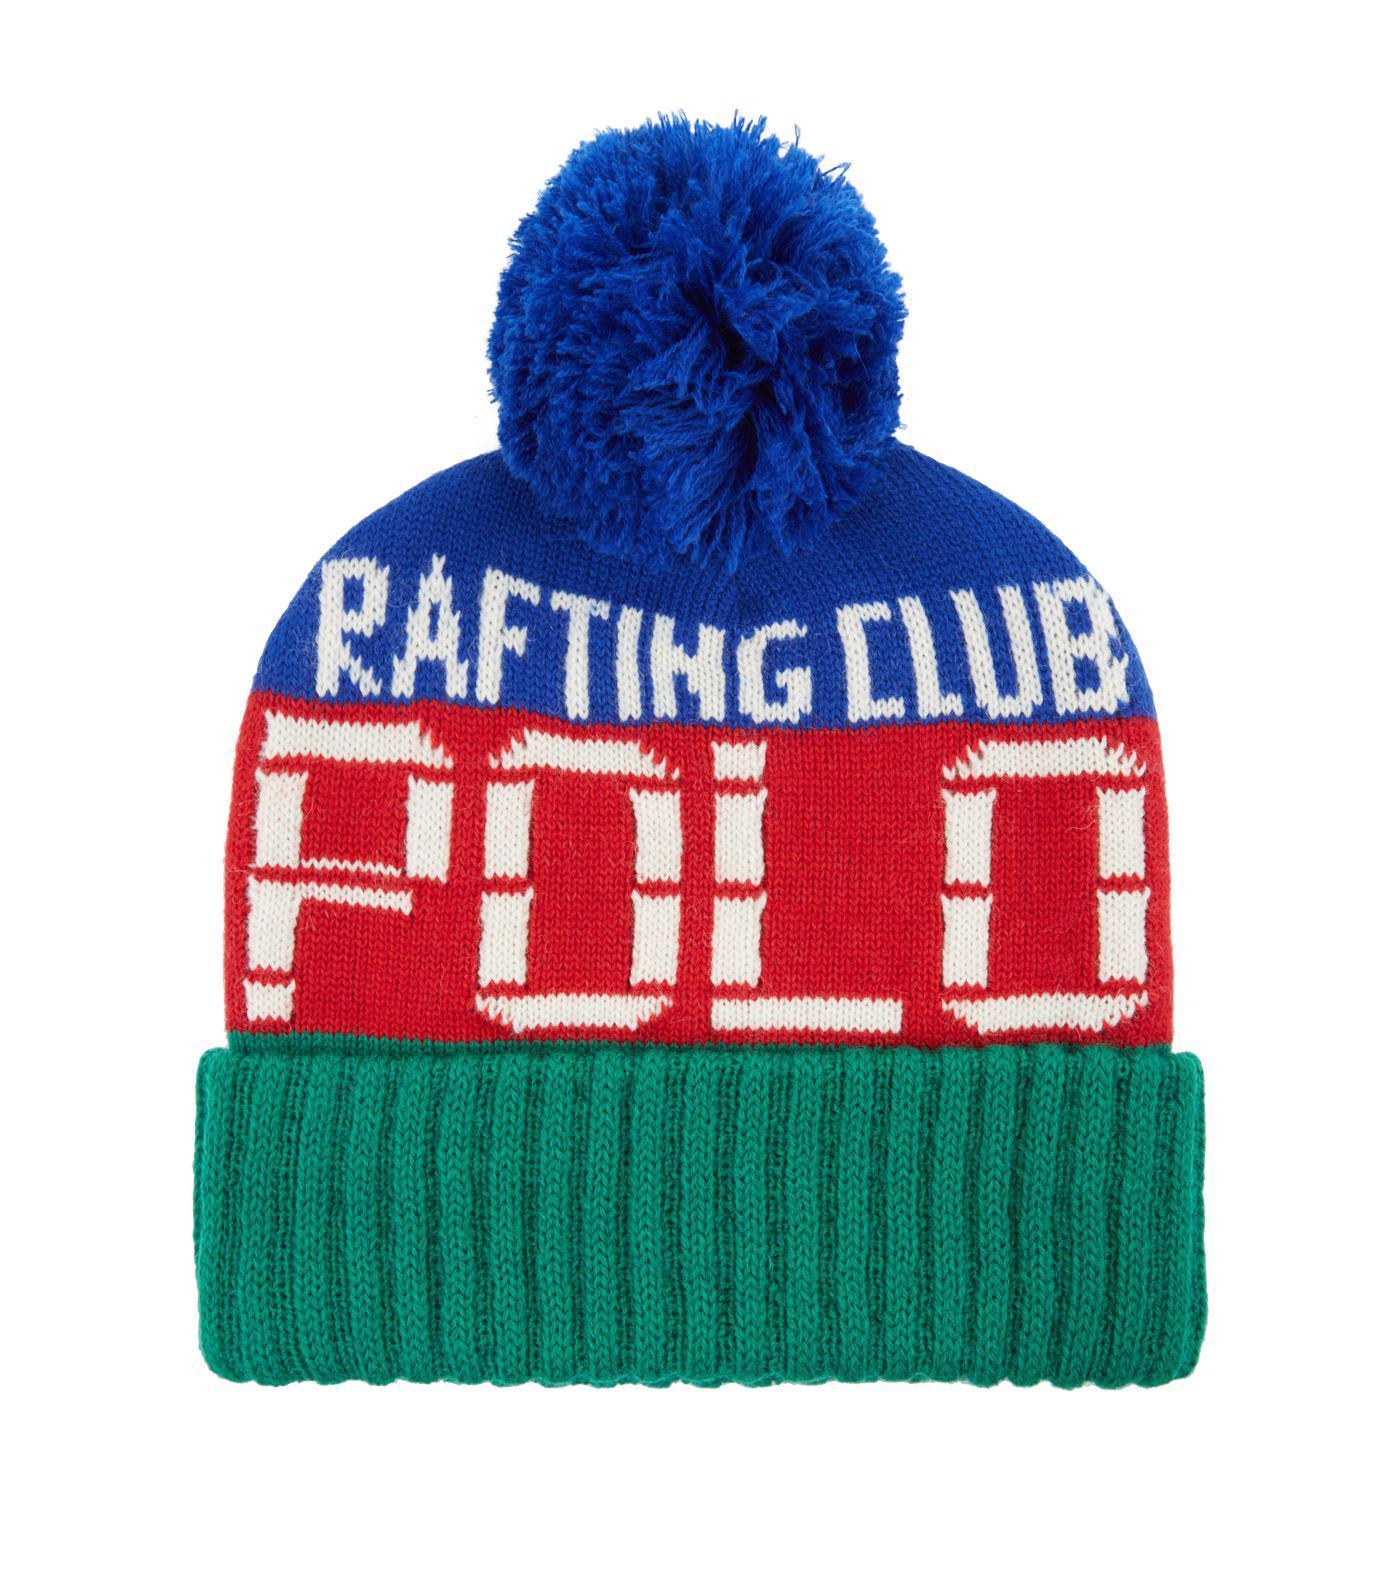 ... official polo ralph lauren. mens hi tech rafting club hat f0254 ea402 1a535dbe36dc